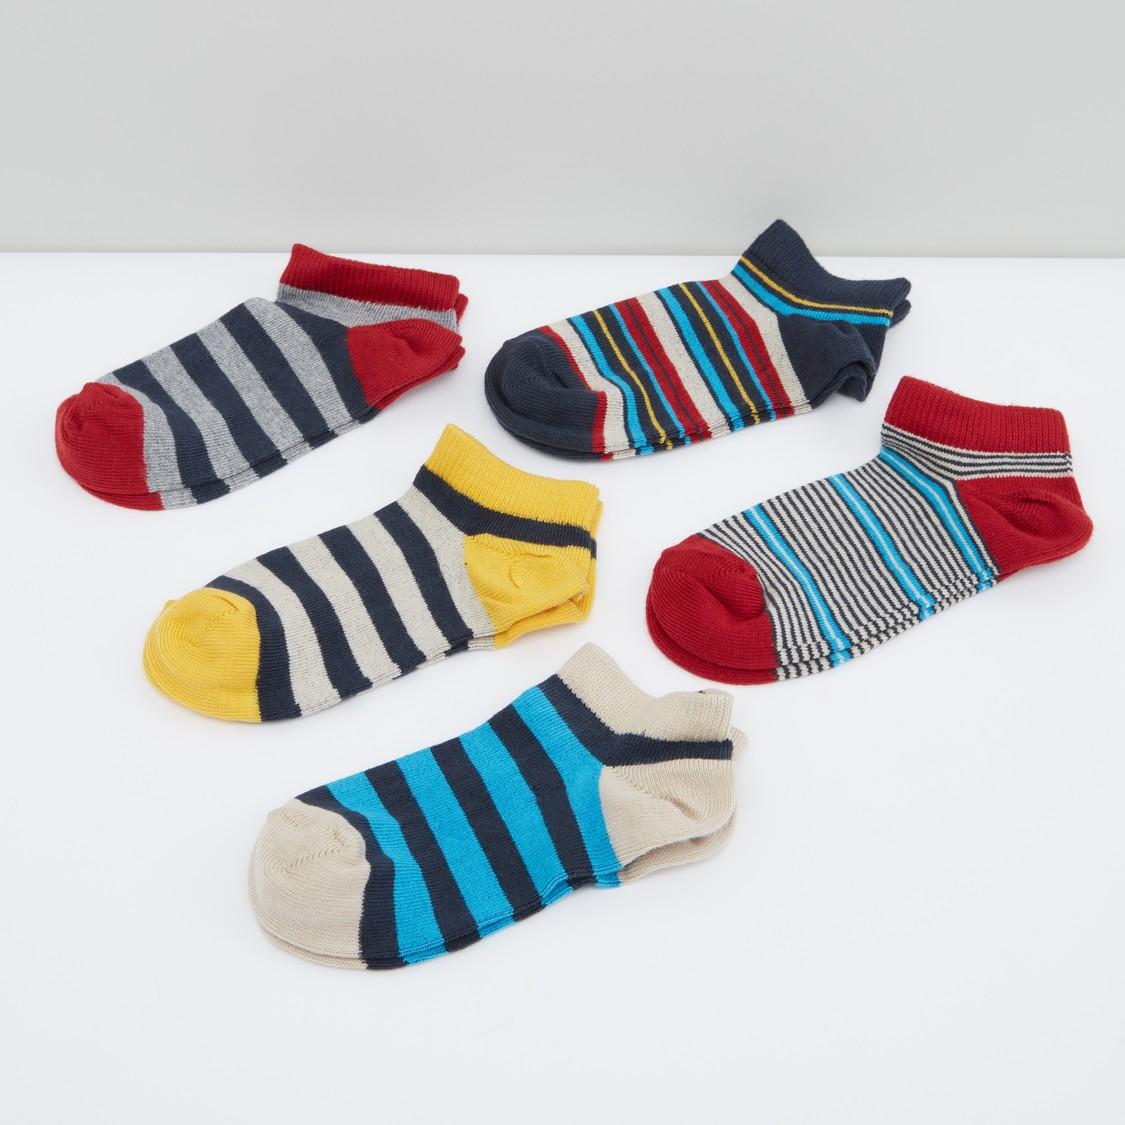 Striped Ankle Length Socks - Set of 4